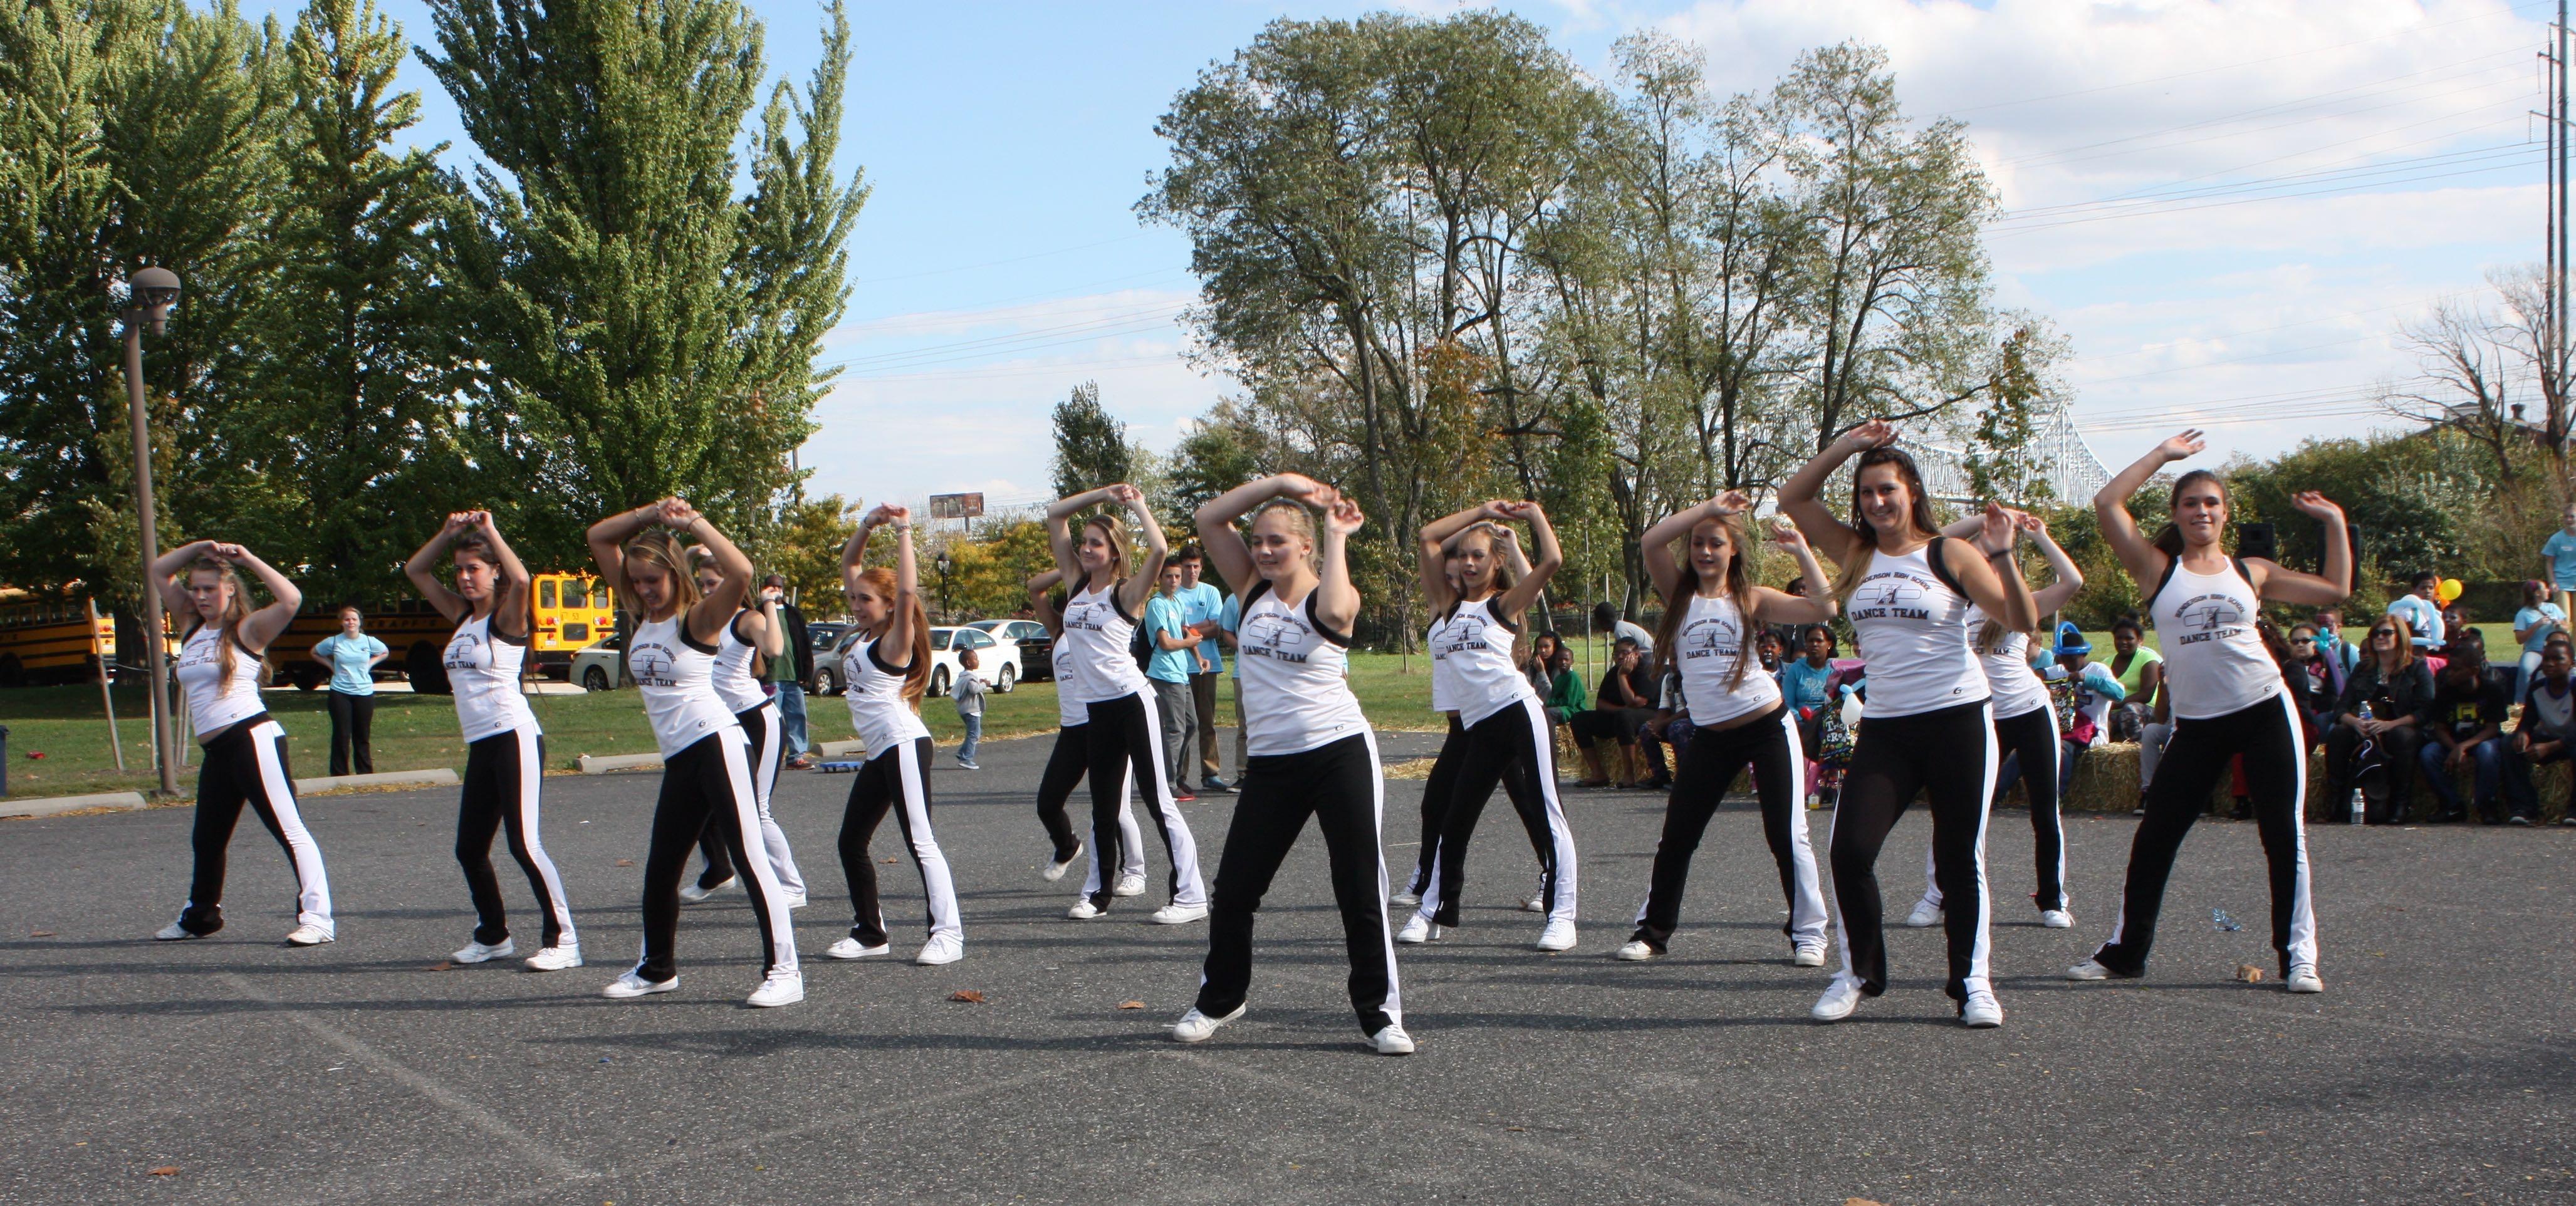 Andrew L Hicks Jr Foundation Fall Carnival 2014